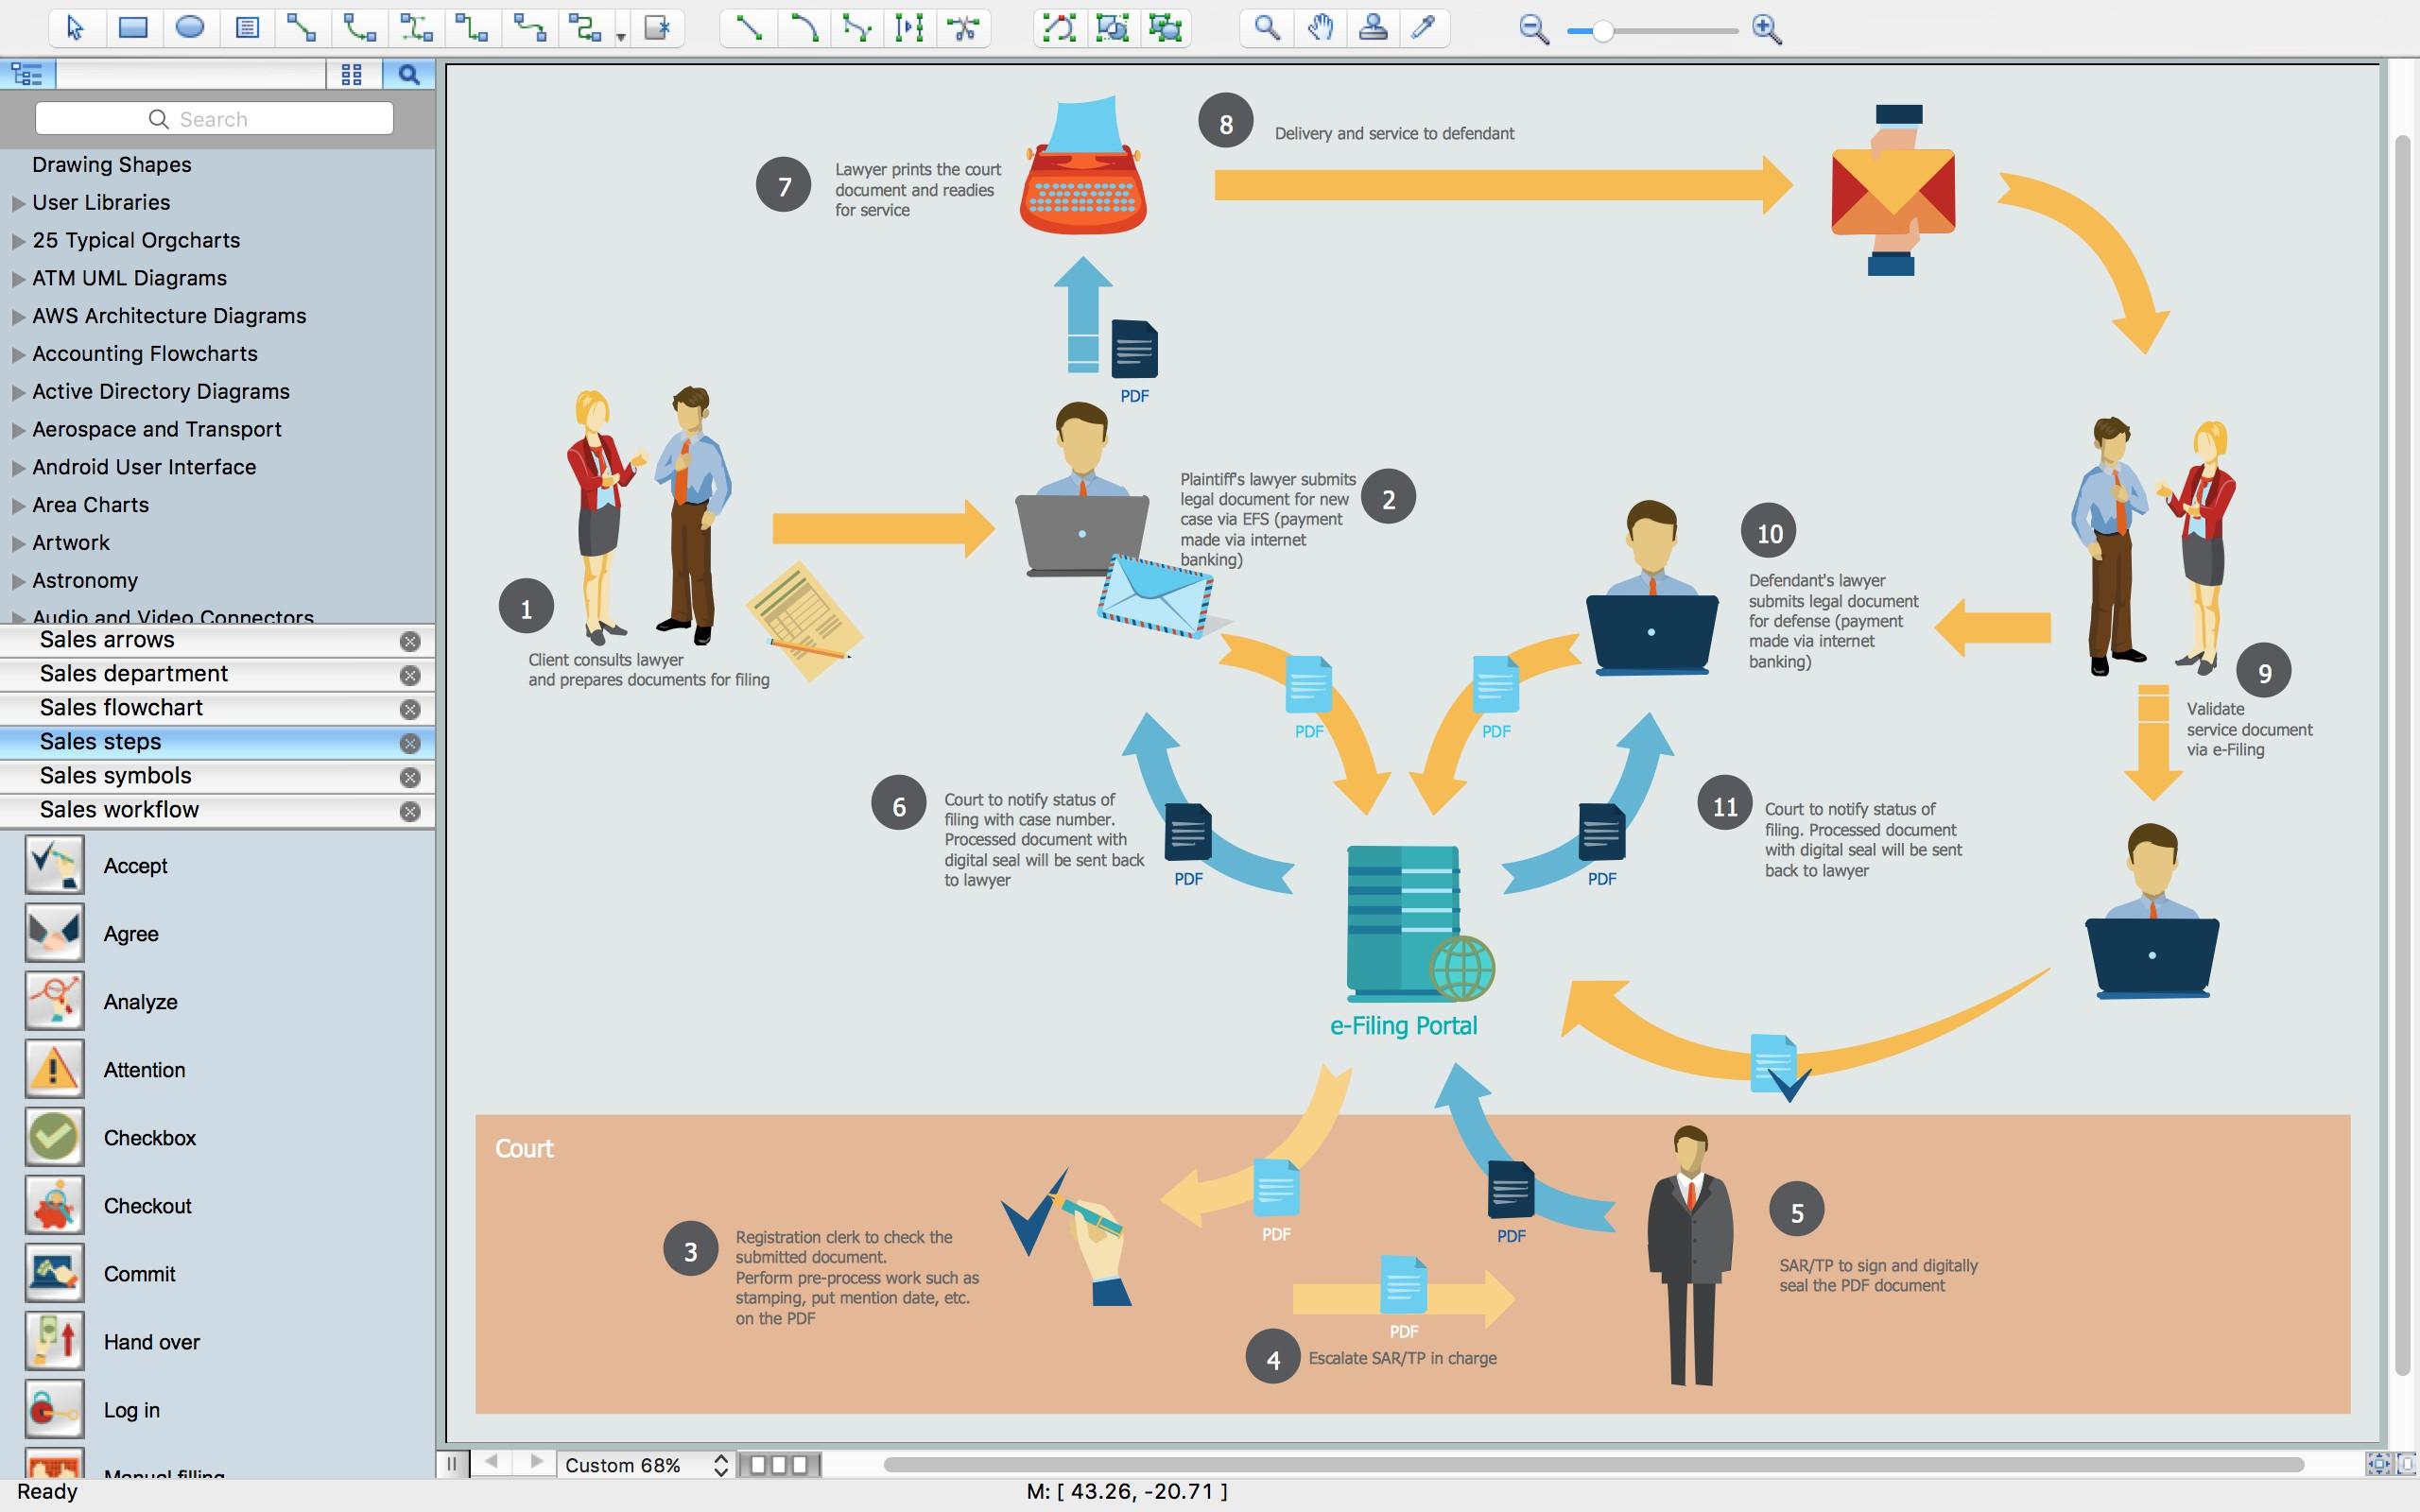 Engineering Design Process Diagram Sales Flowchart Symbols Of Engineering Design Process Diagram